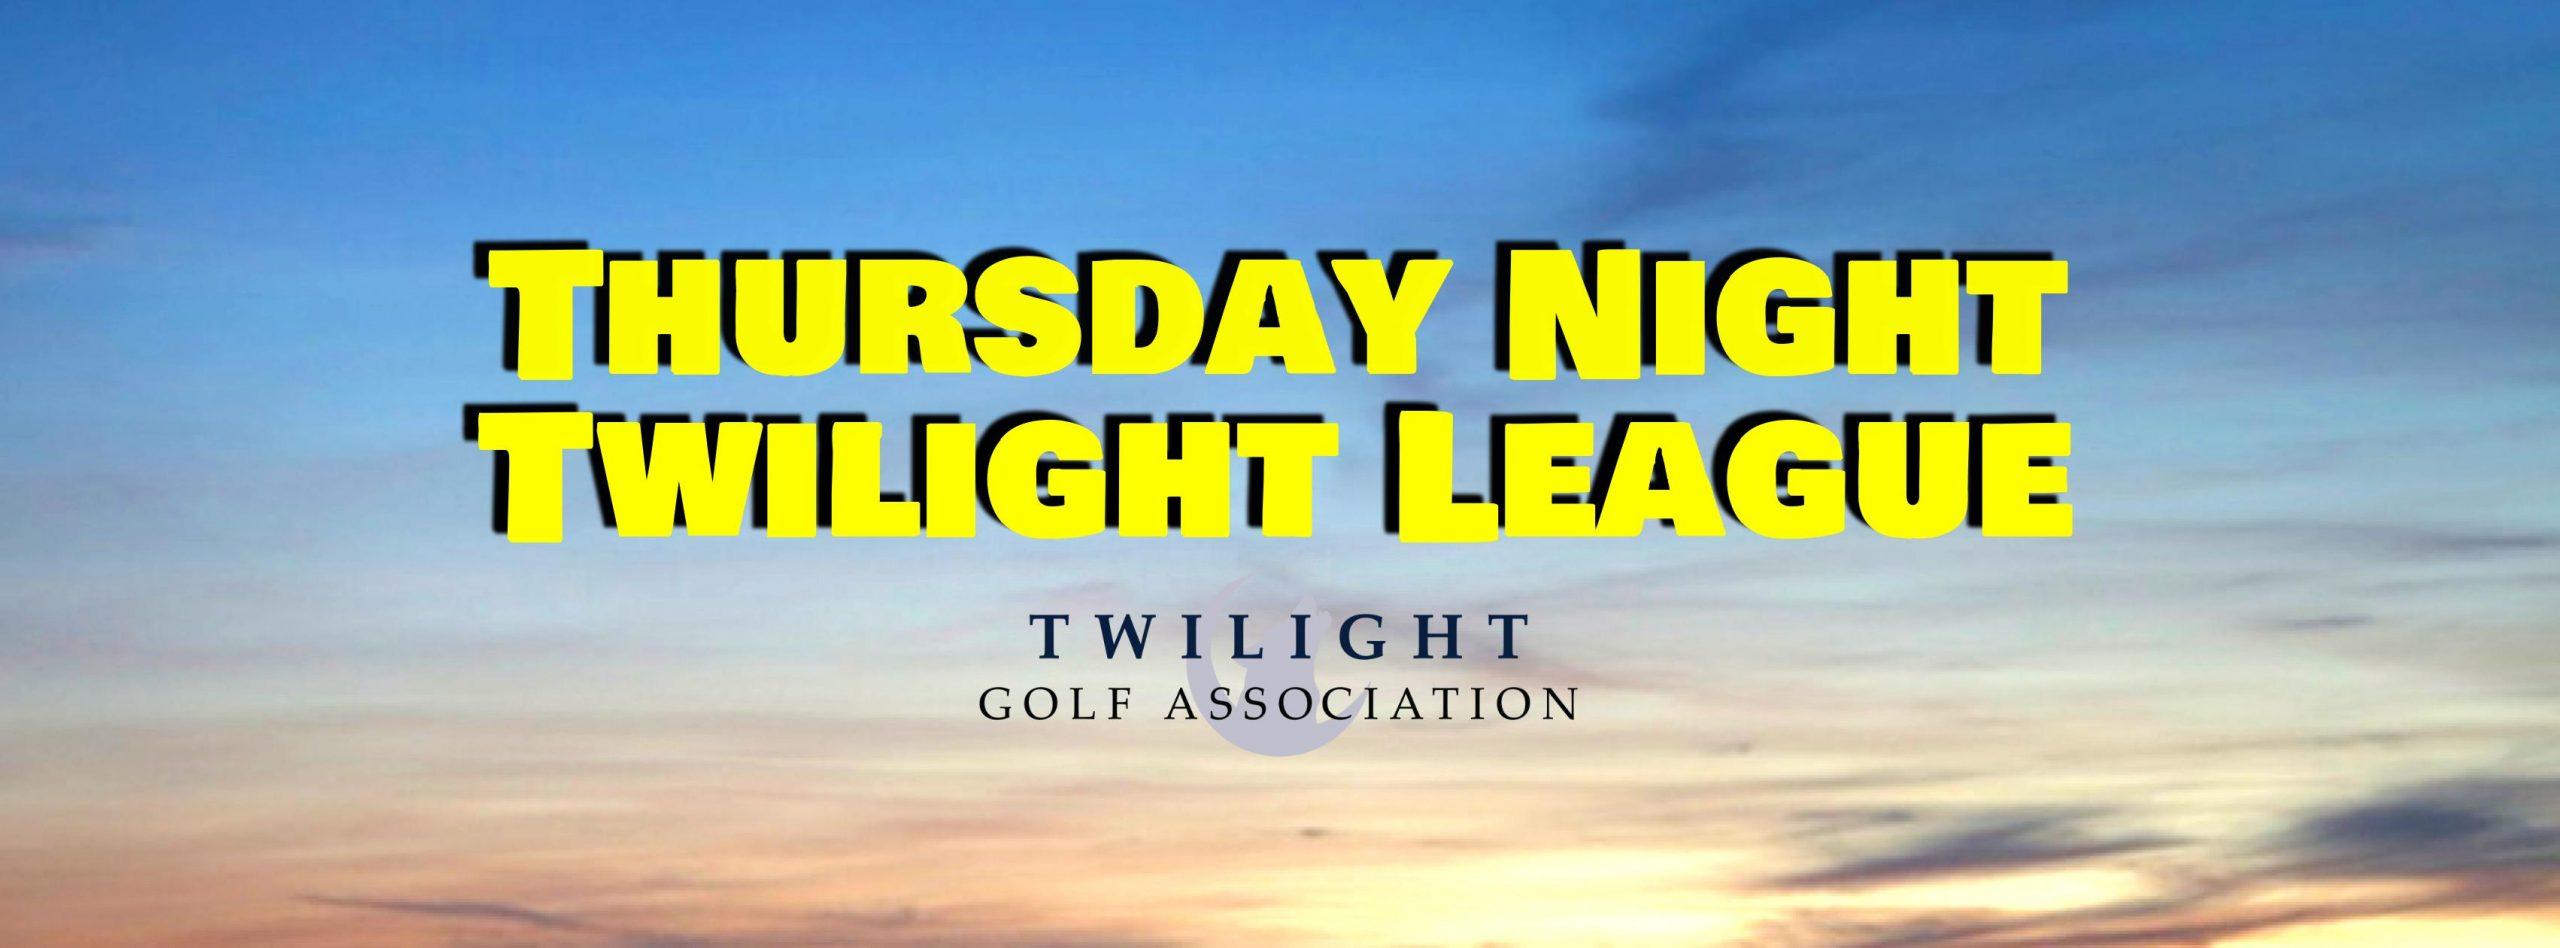 Thursday Twilight League at Northwest Golf Course